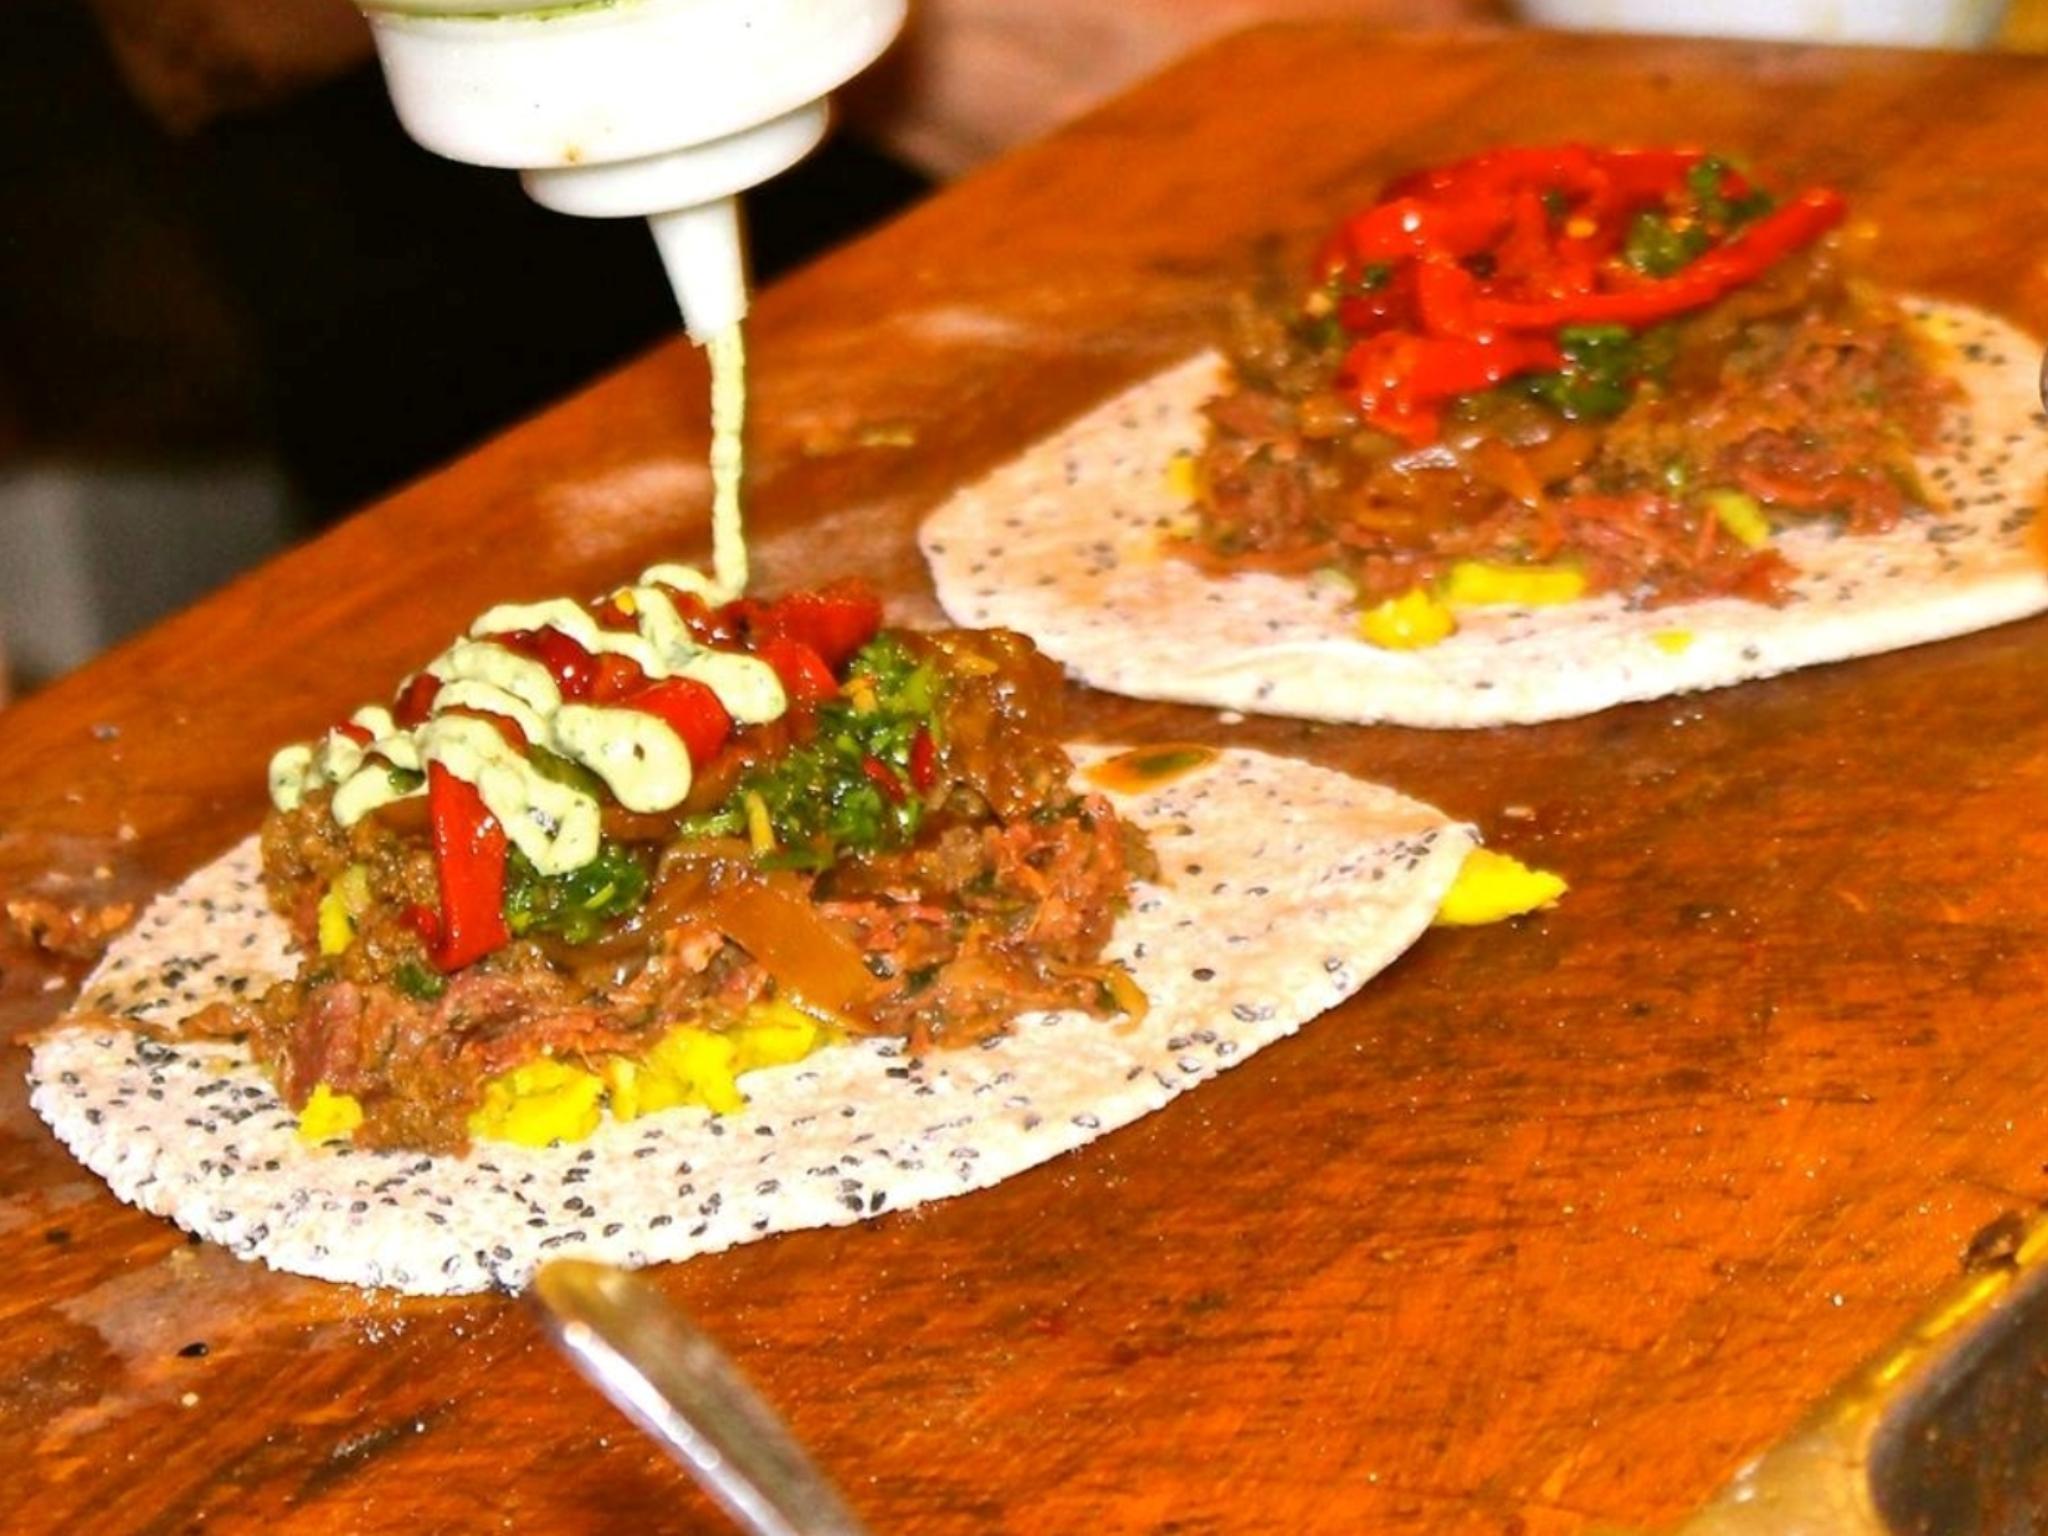 Mahane Yehuda Market Middle Eastern Pita To Israeli Street Food